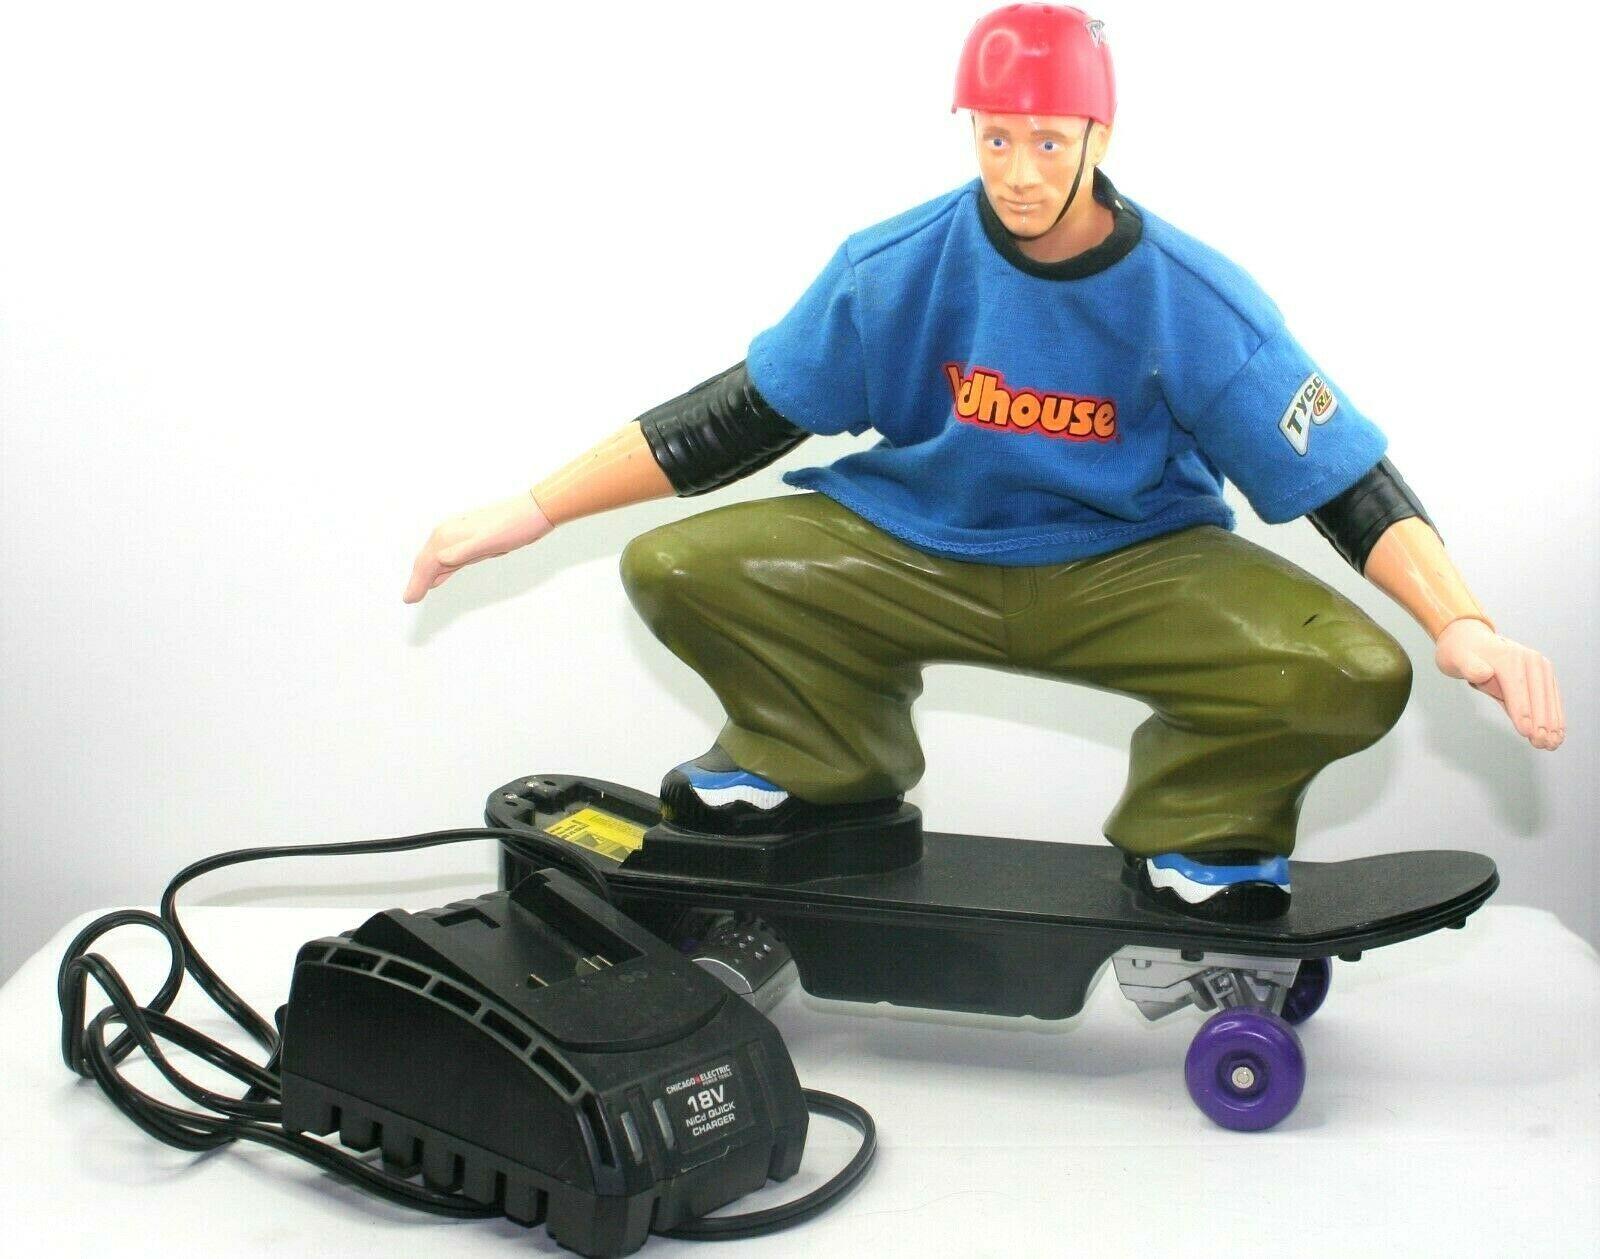 Tony Hawk R/C Skateboarder Extreme Tyco Birdhouse Mattel No Battery Or Remote - $13.99